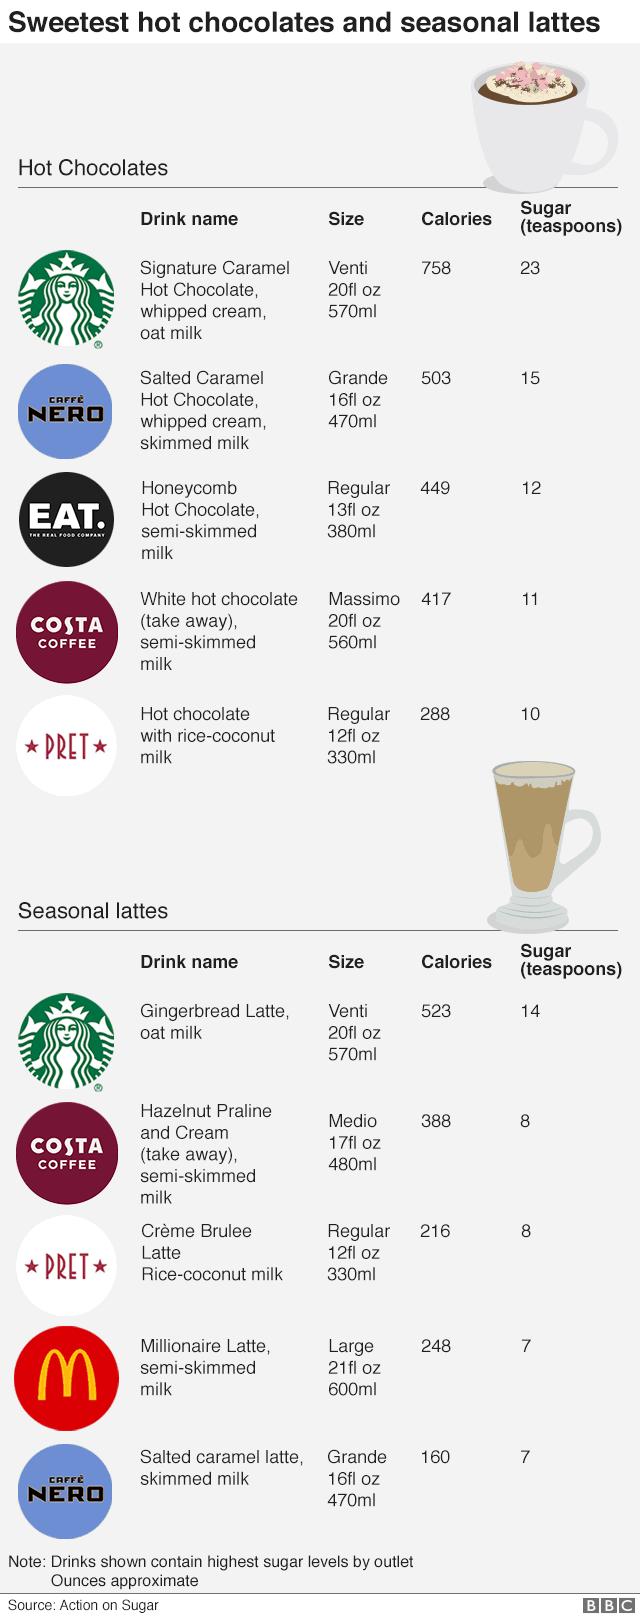 Infographic showing sweetest hot chocolates and seasonal lattes